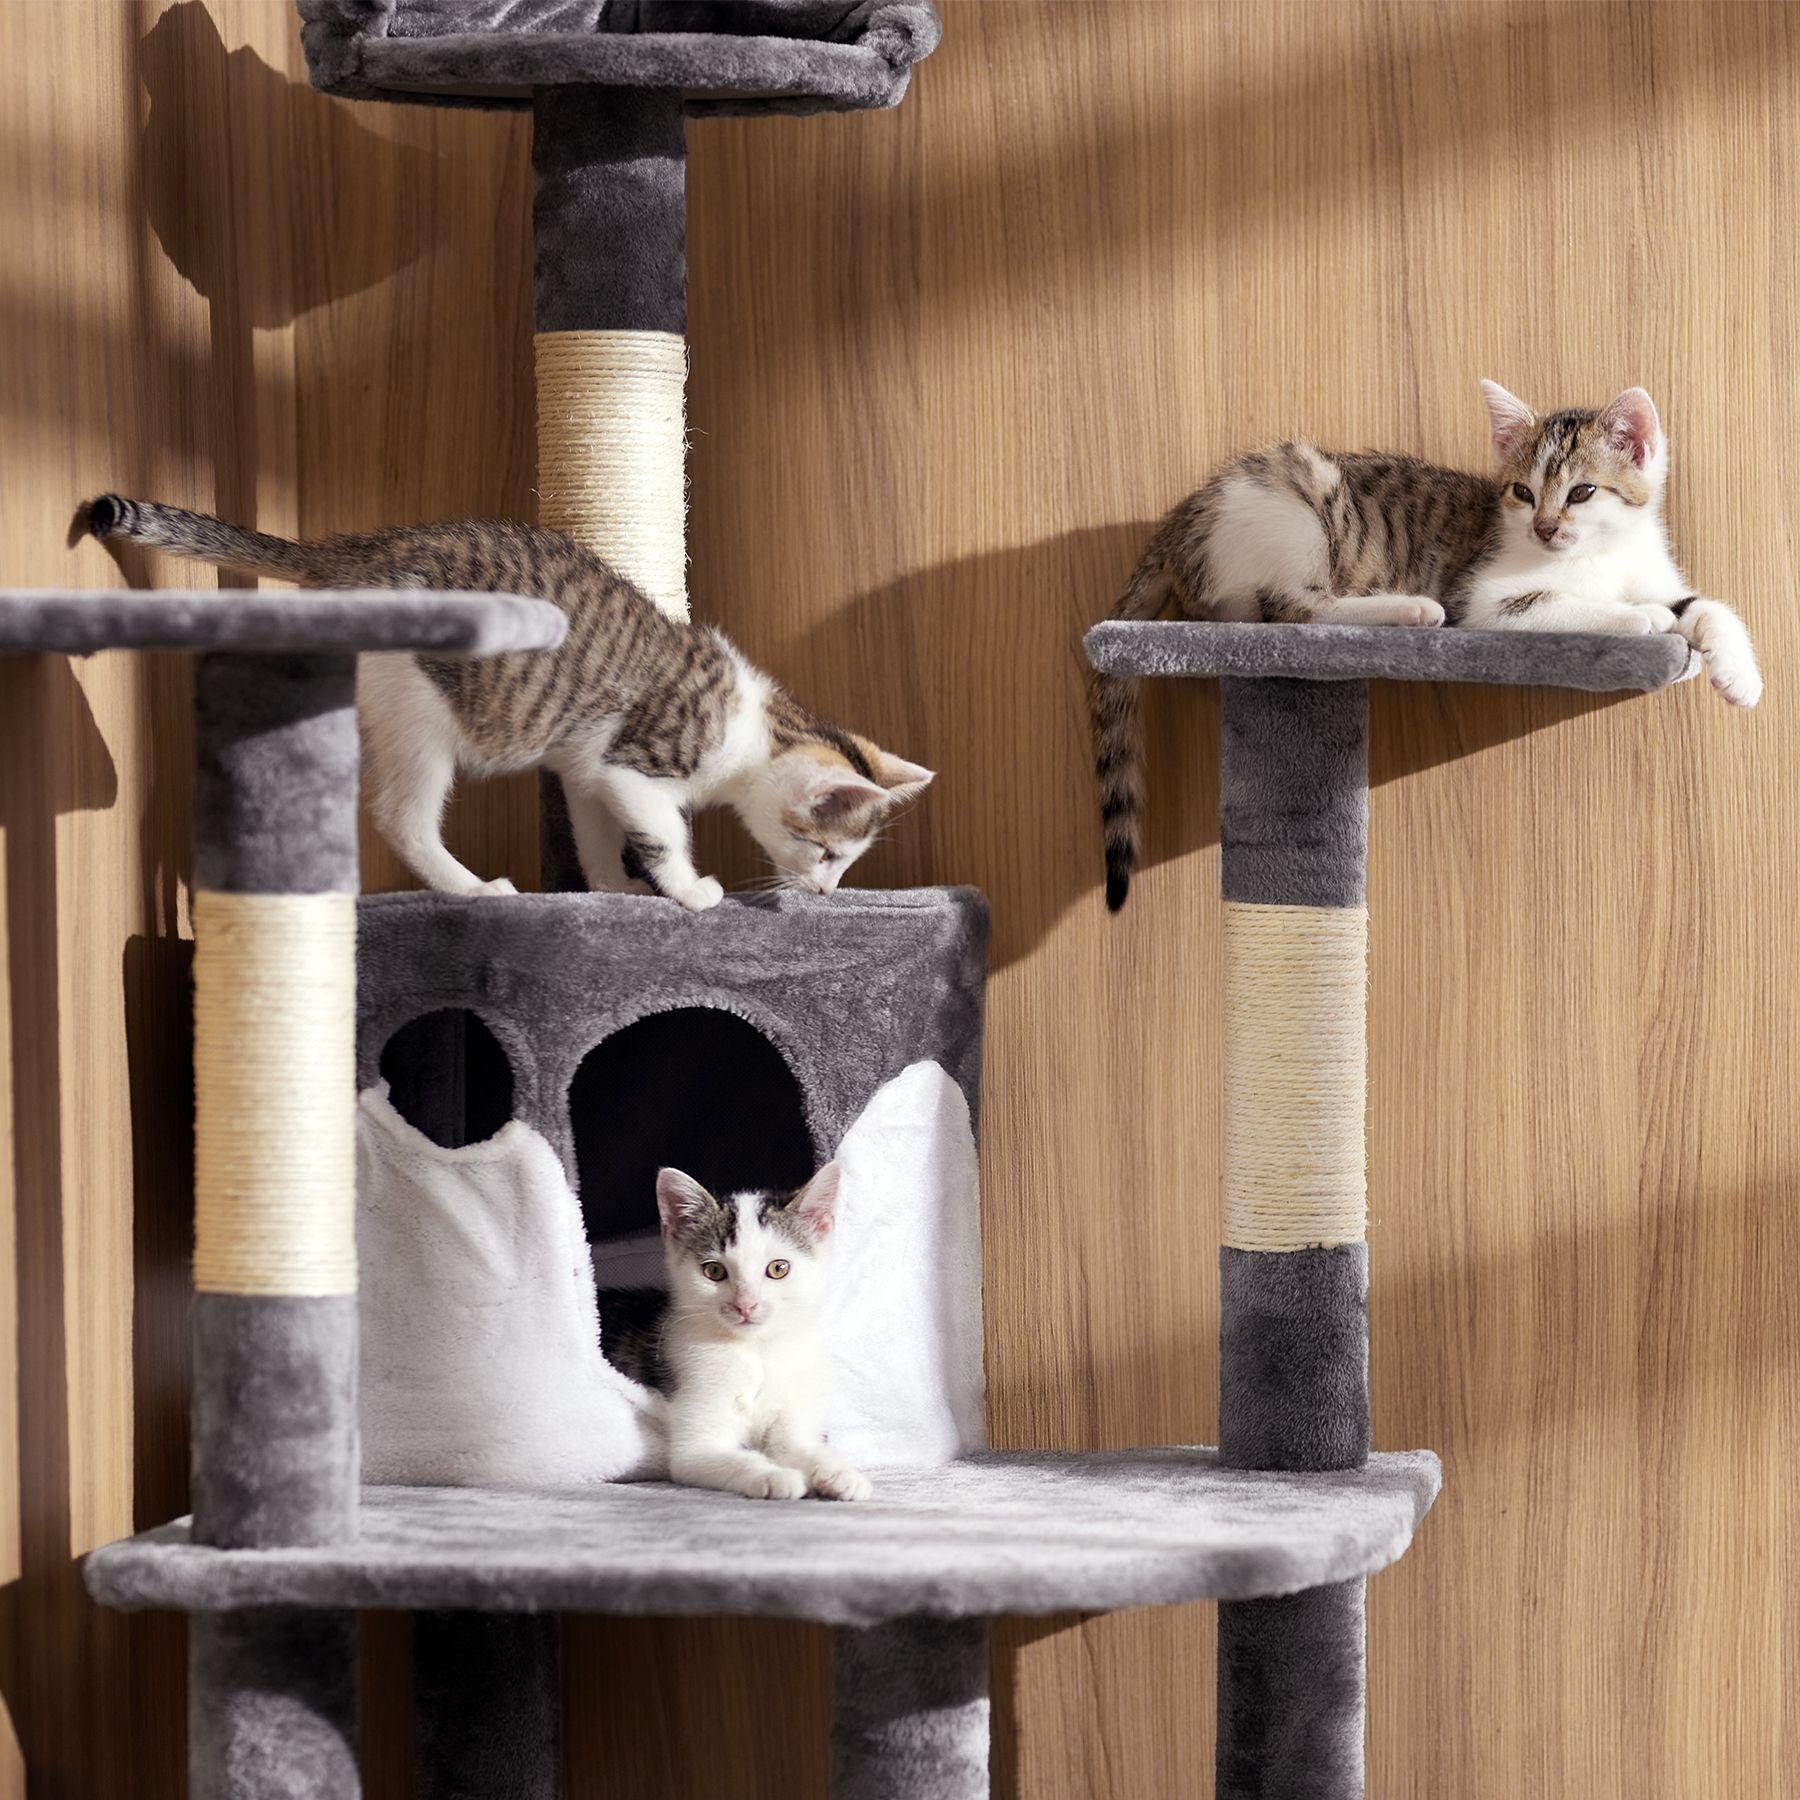 kratzbaum f r katzen katzenkratzbaum katzenbaum kletterbaum sisal beige wei ebay. Black Bedroom Furniture Sets. Home Design Ideas